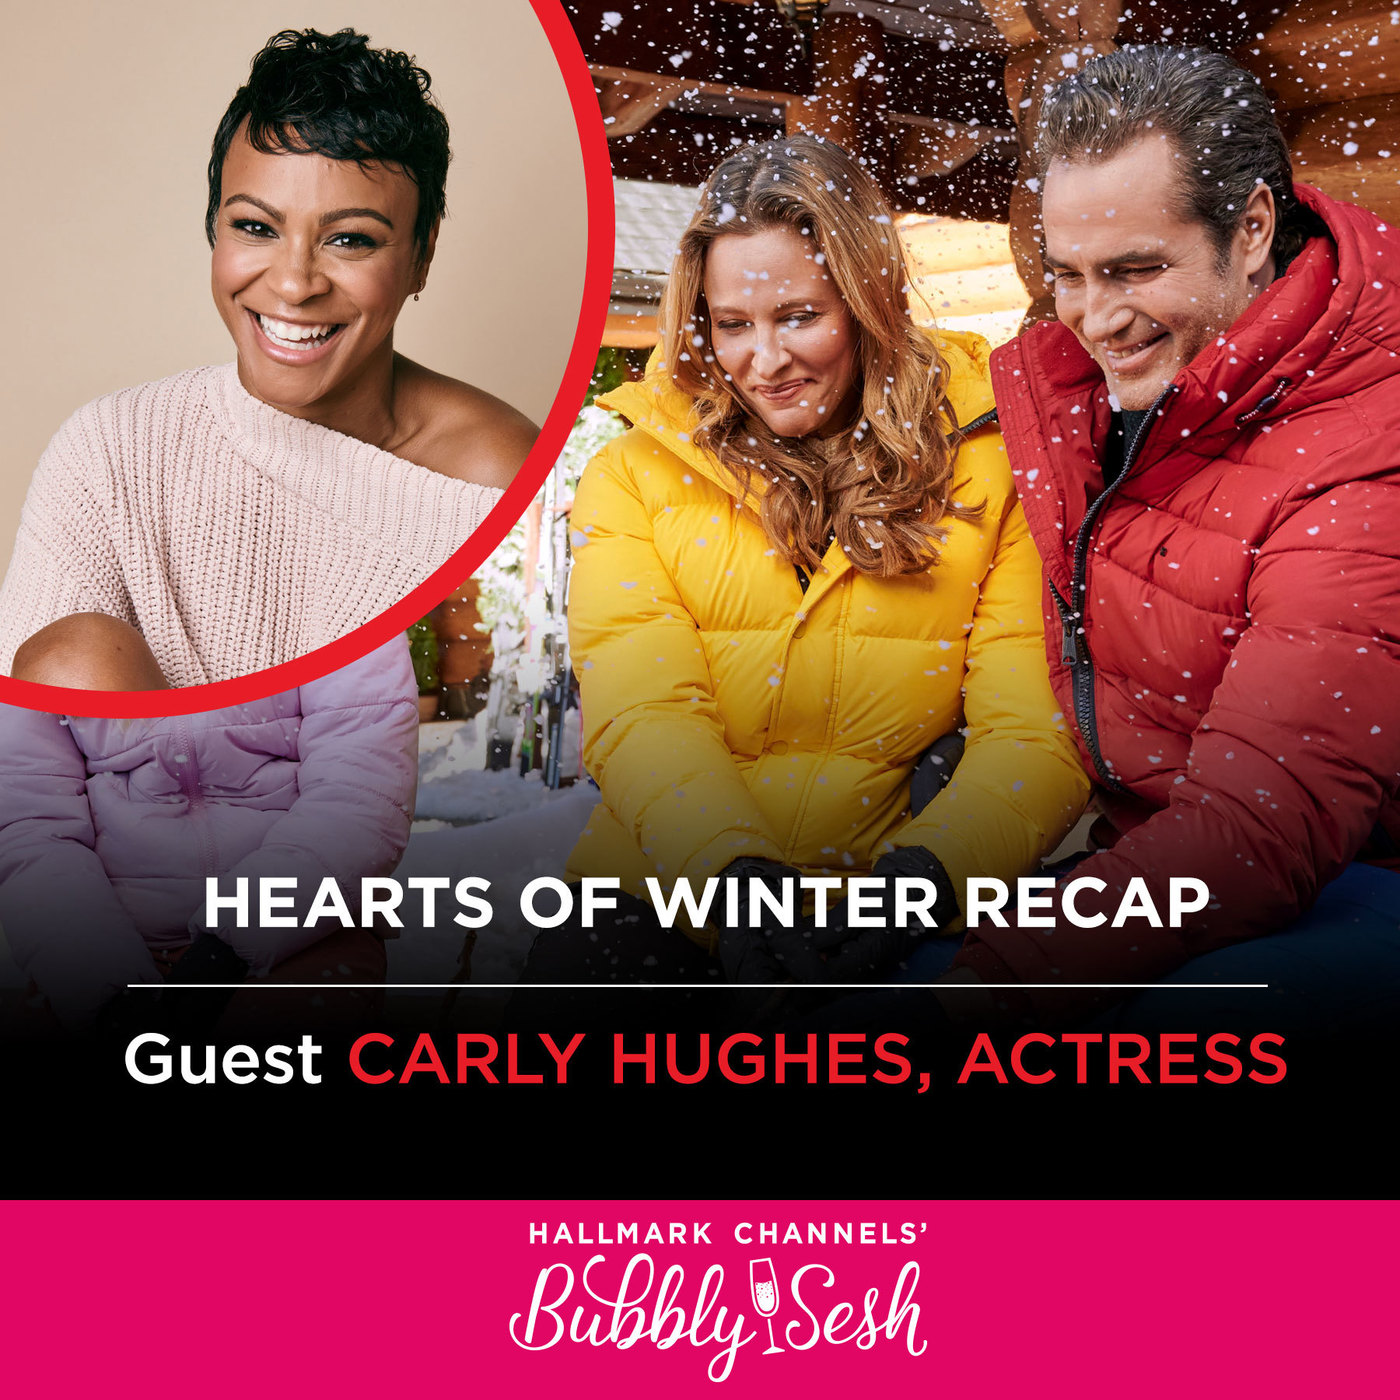 Hearts of Winter Recap with Carly Hughes, Actress